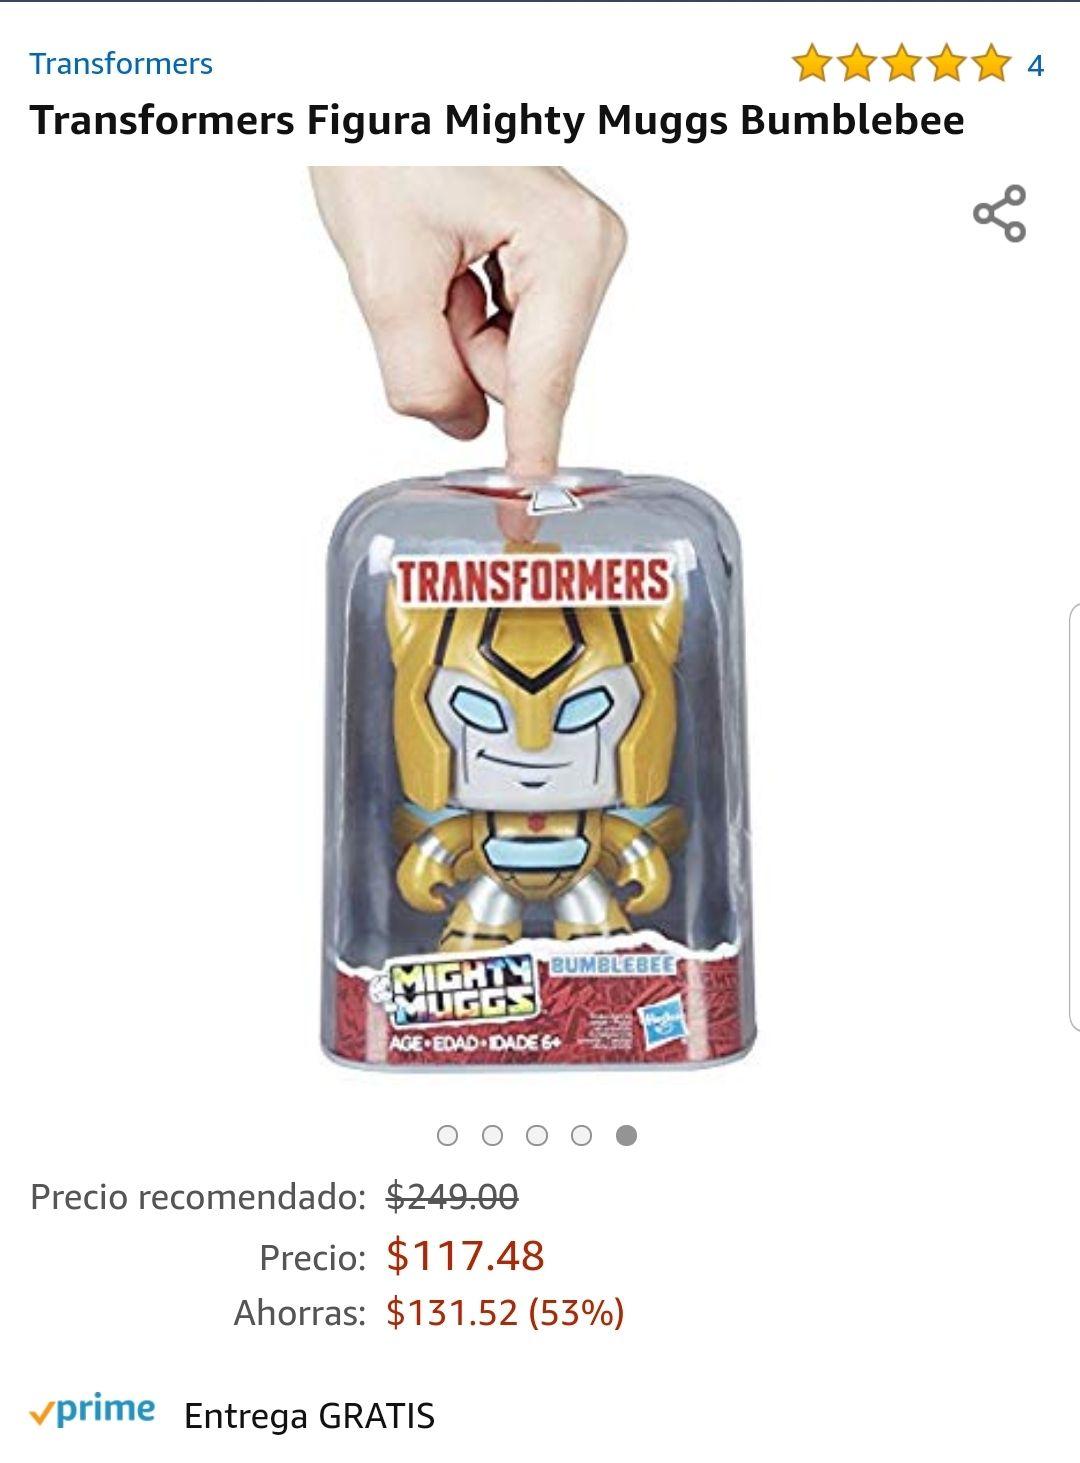 Amazon: Transformers Figura Mighty Muggs Bumblebee